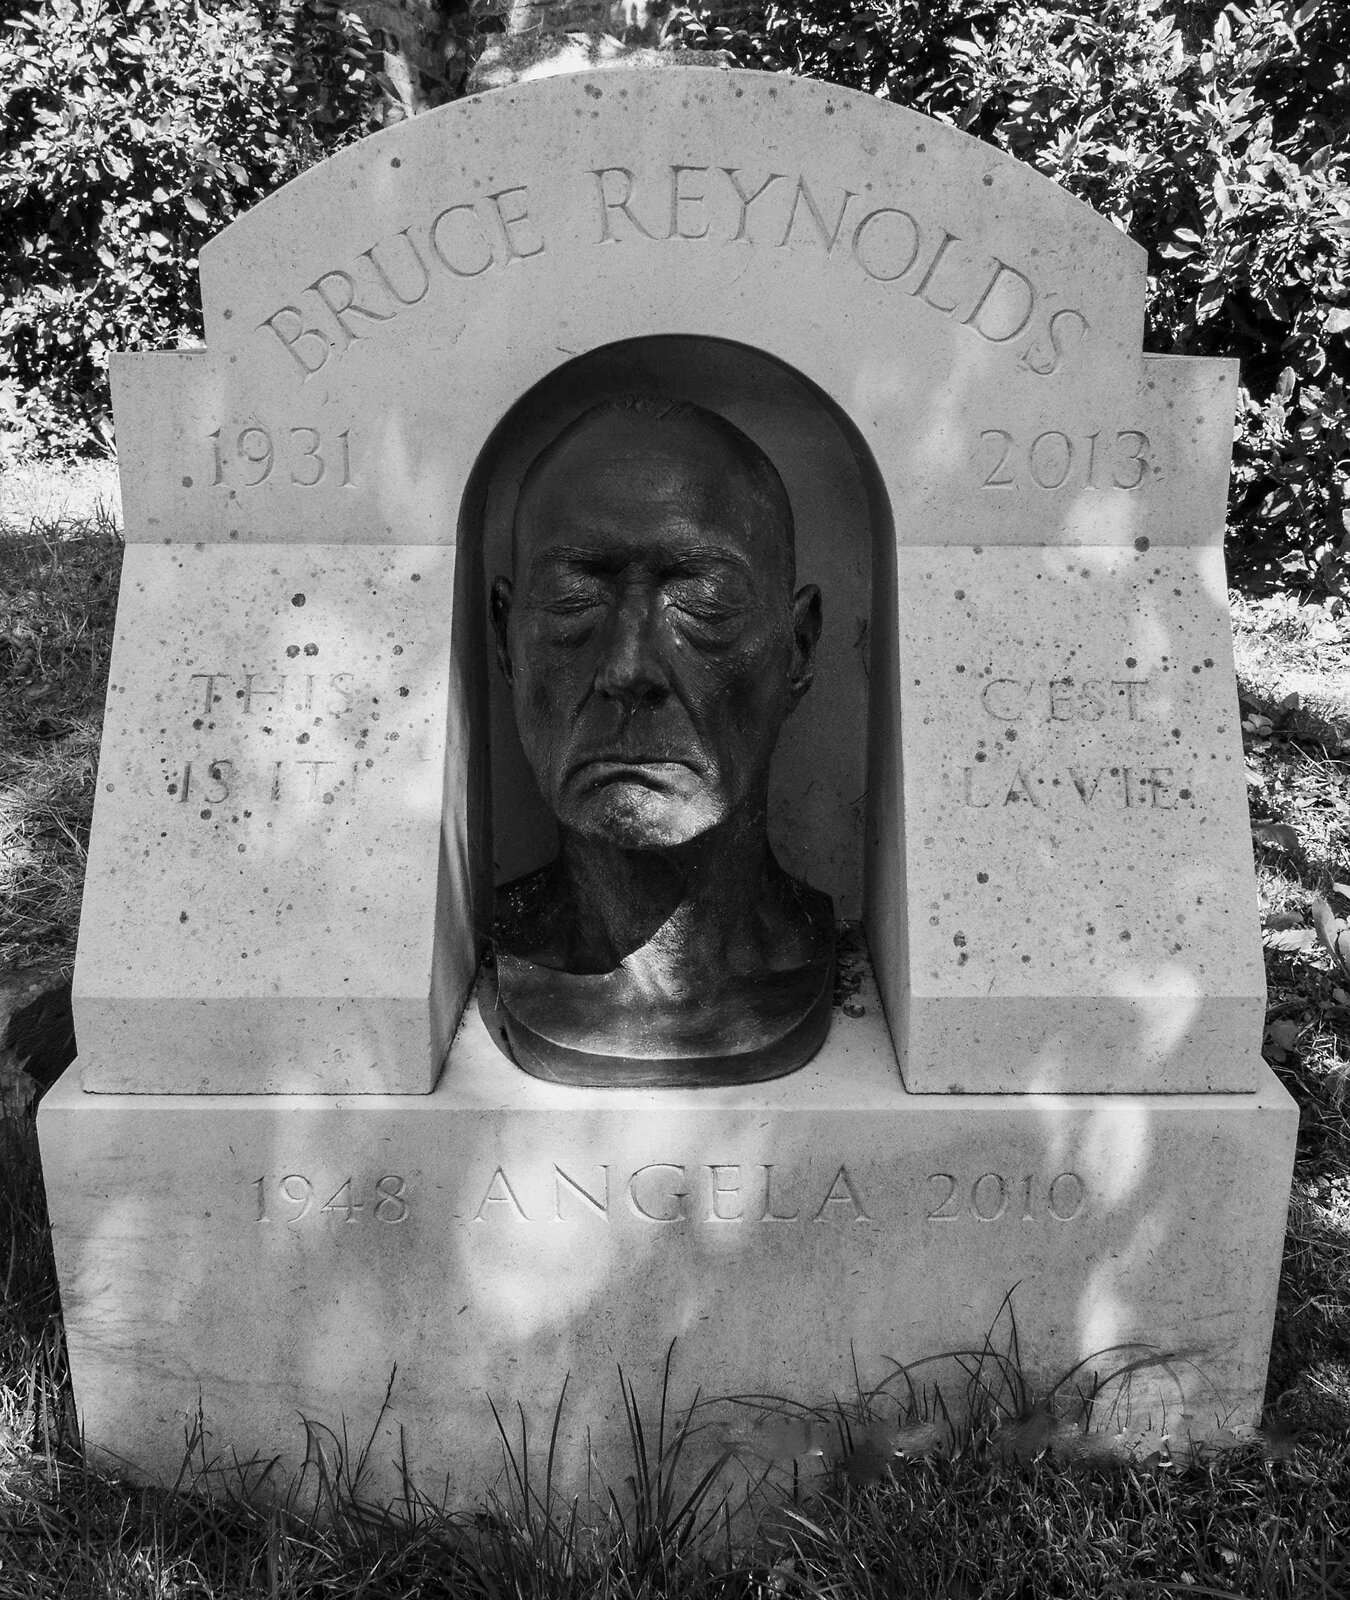 Bruce Reynolds.jpg